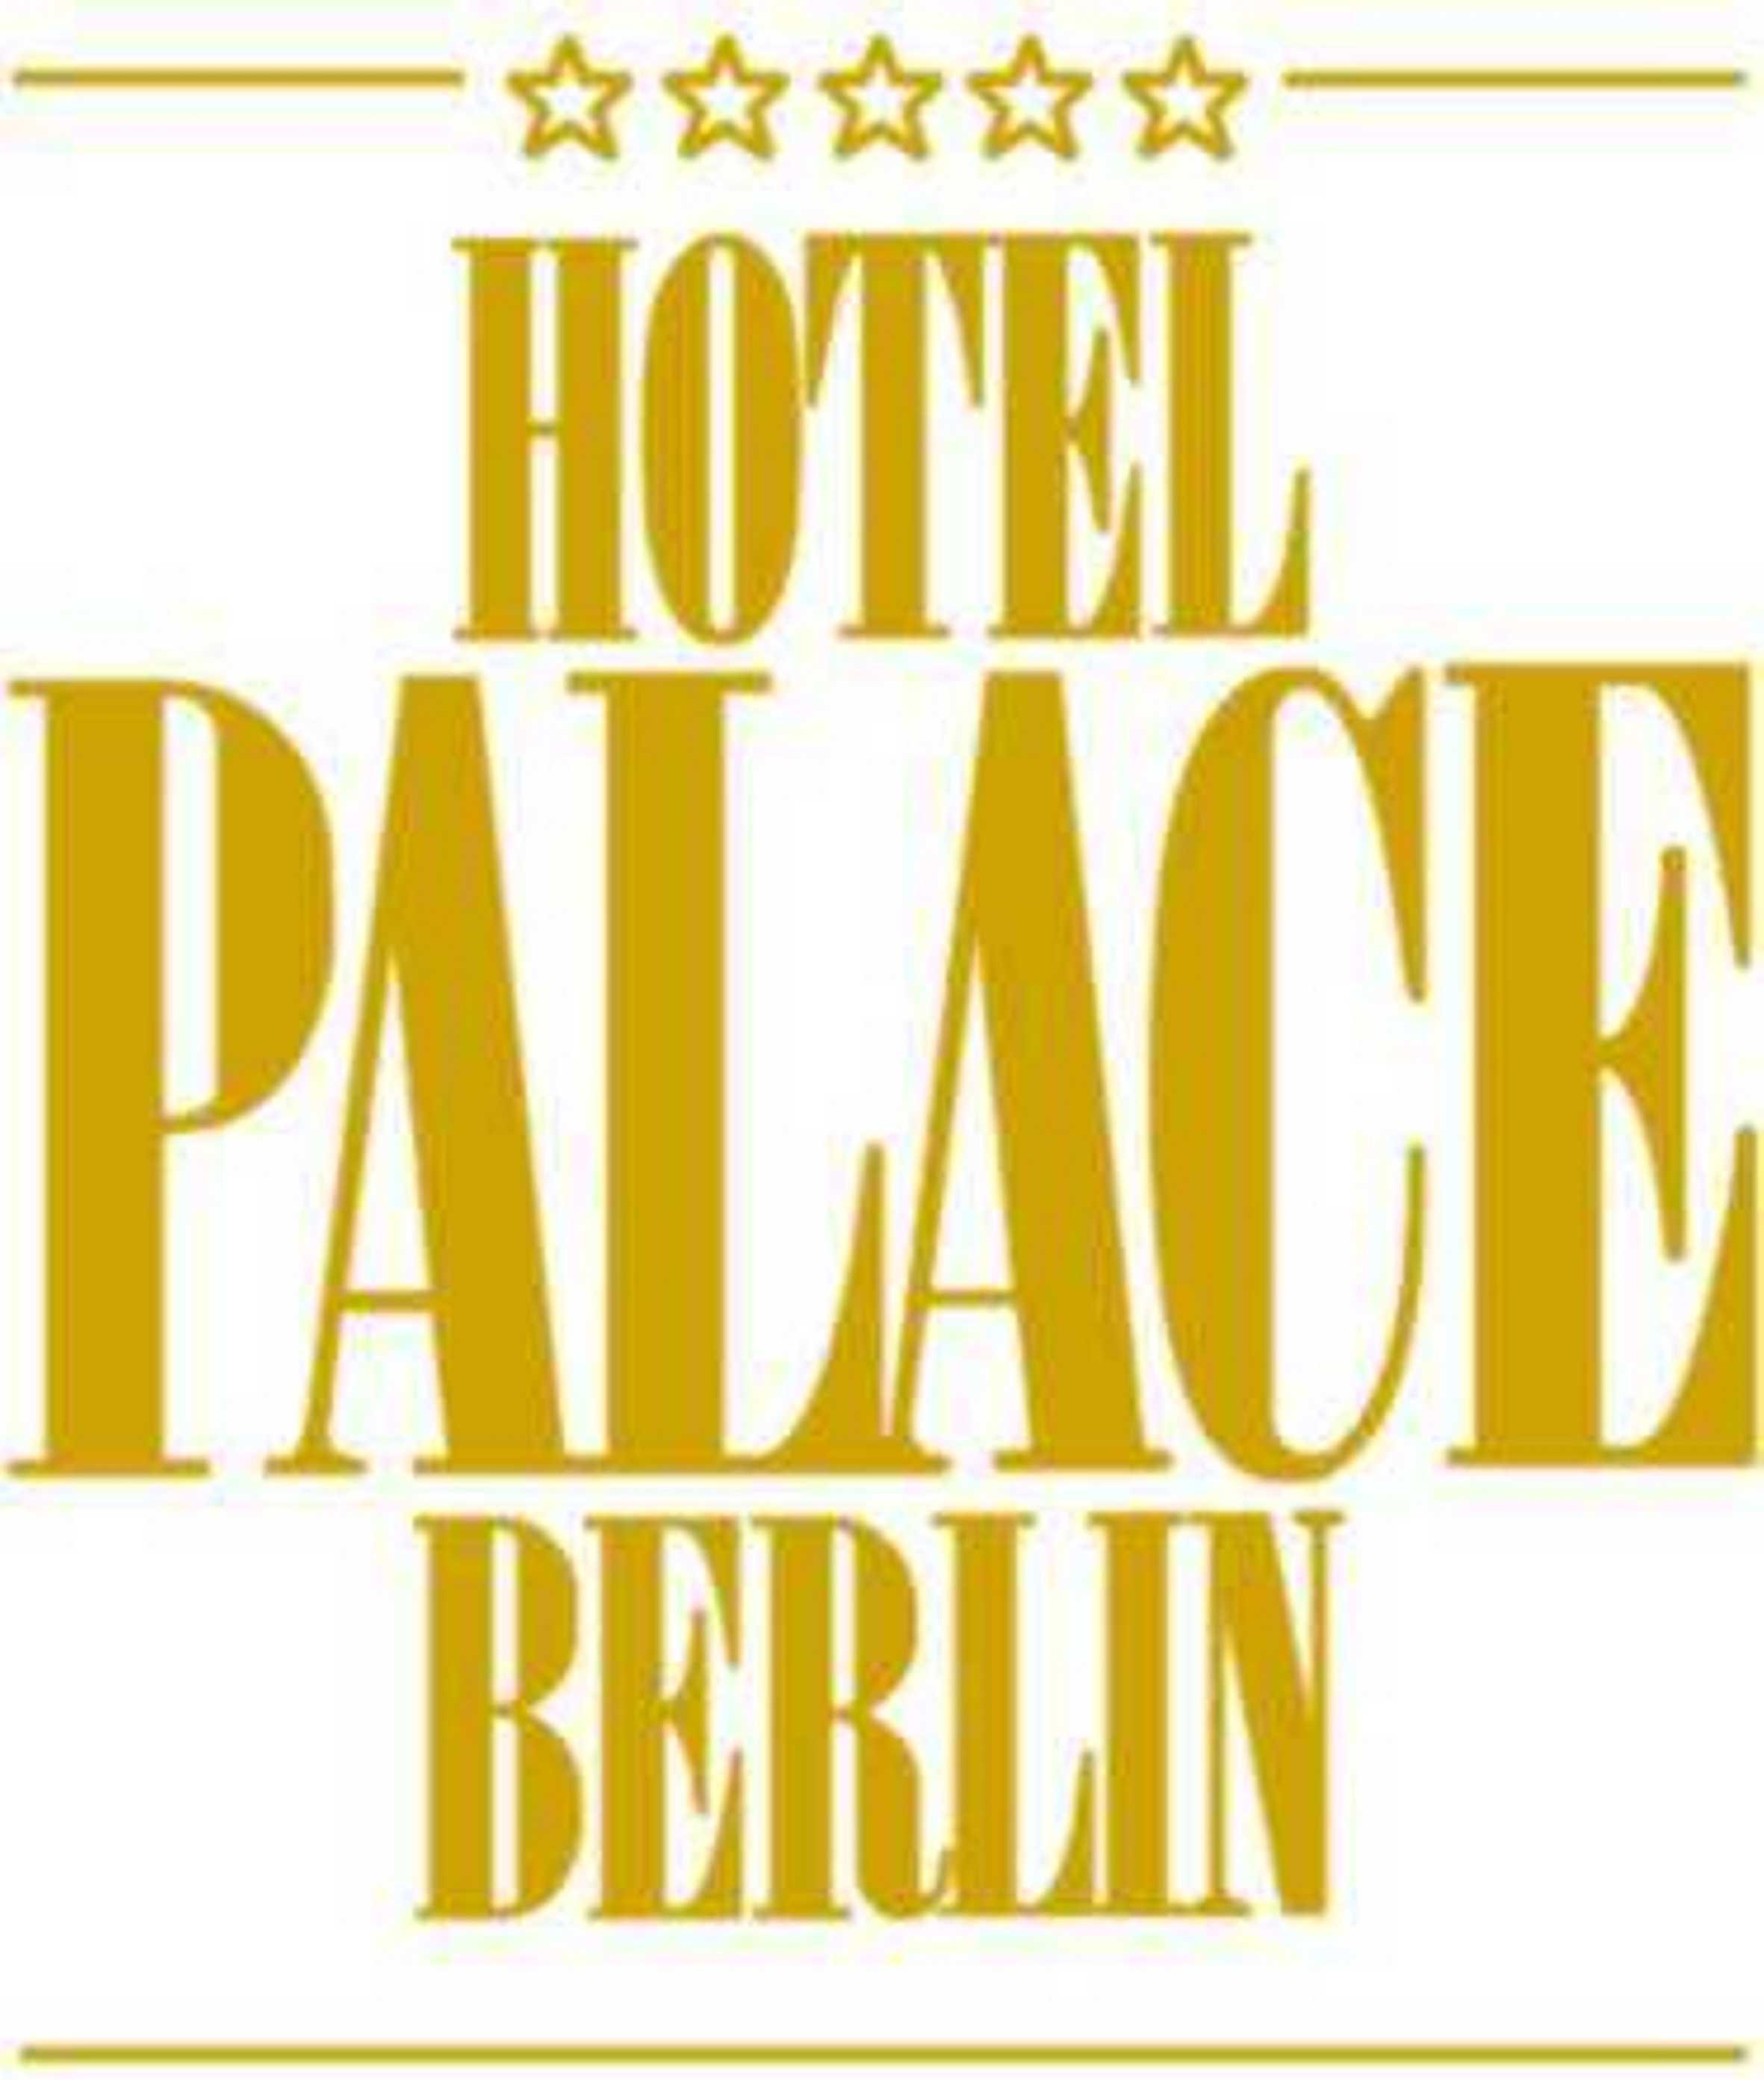 6.1 Hotel Palace.jpg